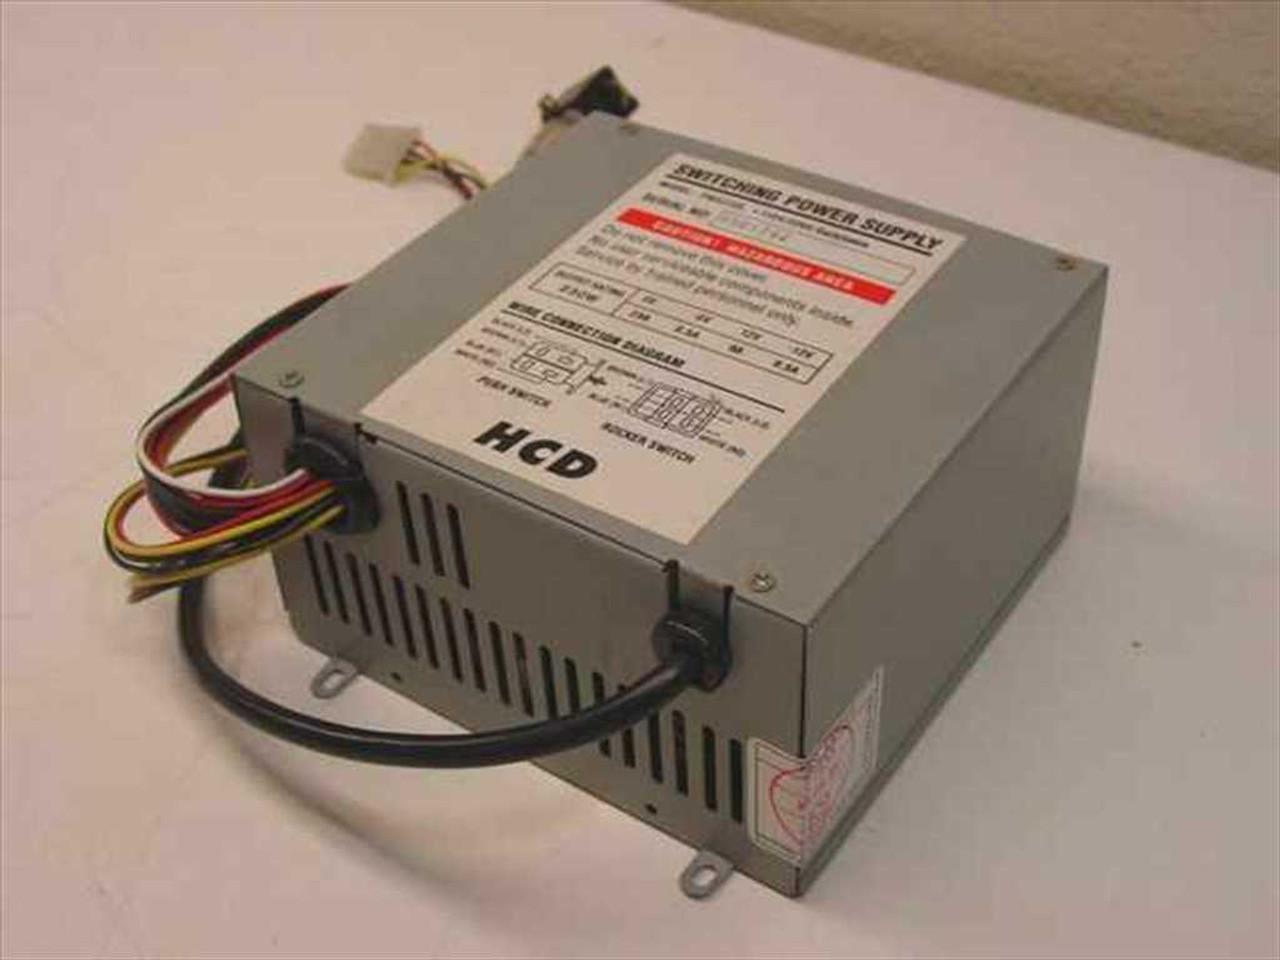 Hcd Pws230l Switching Power Supply 230 Watt 2